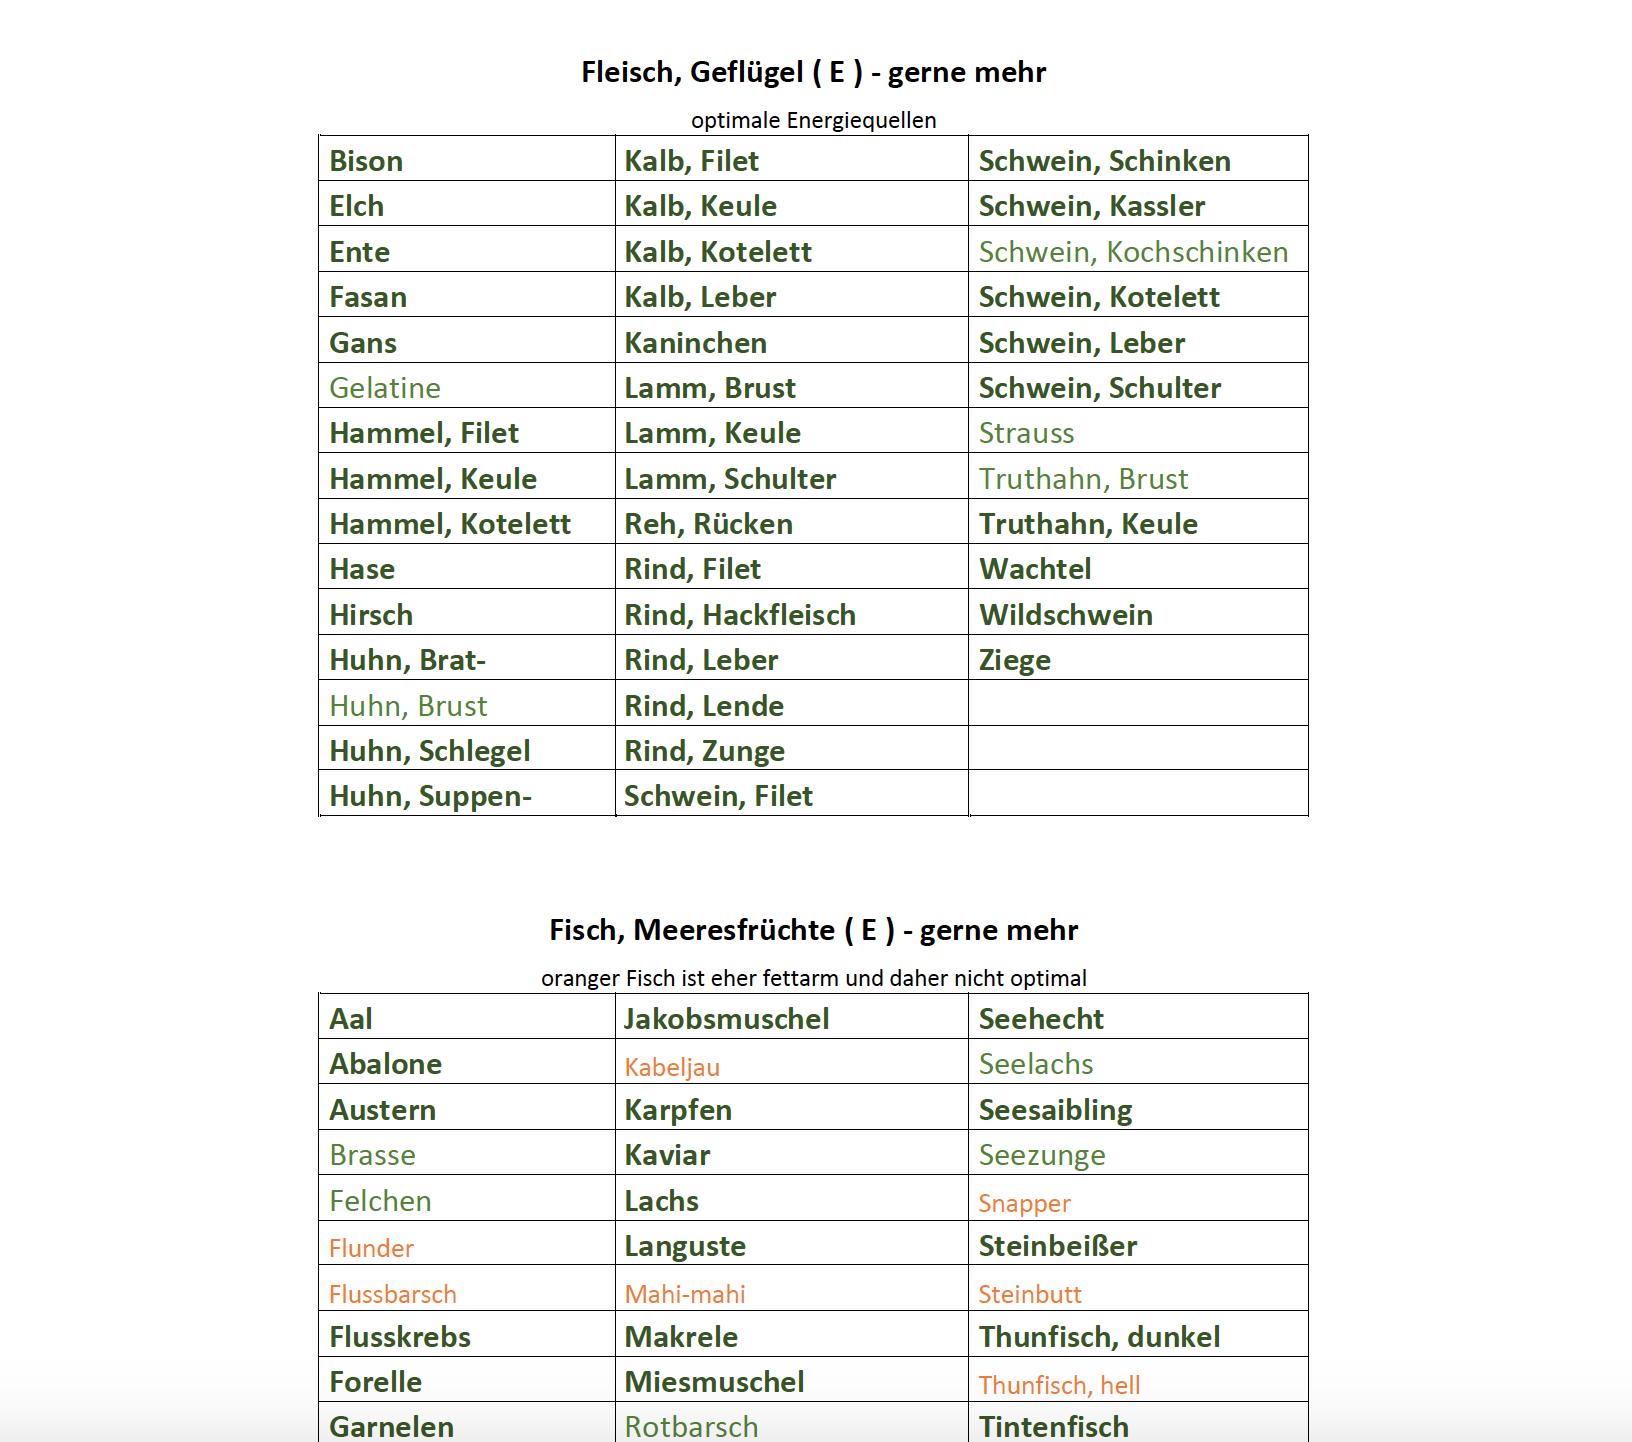 Liste  Lebensmittel  Empfehlung  Ernährungsempfehlung  Ernährung